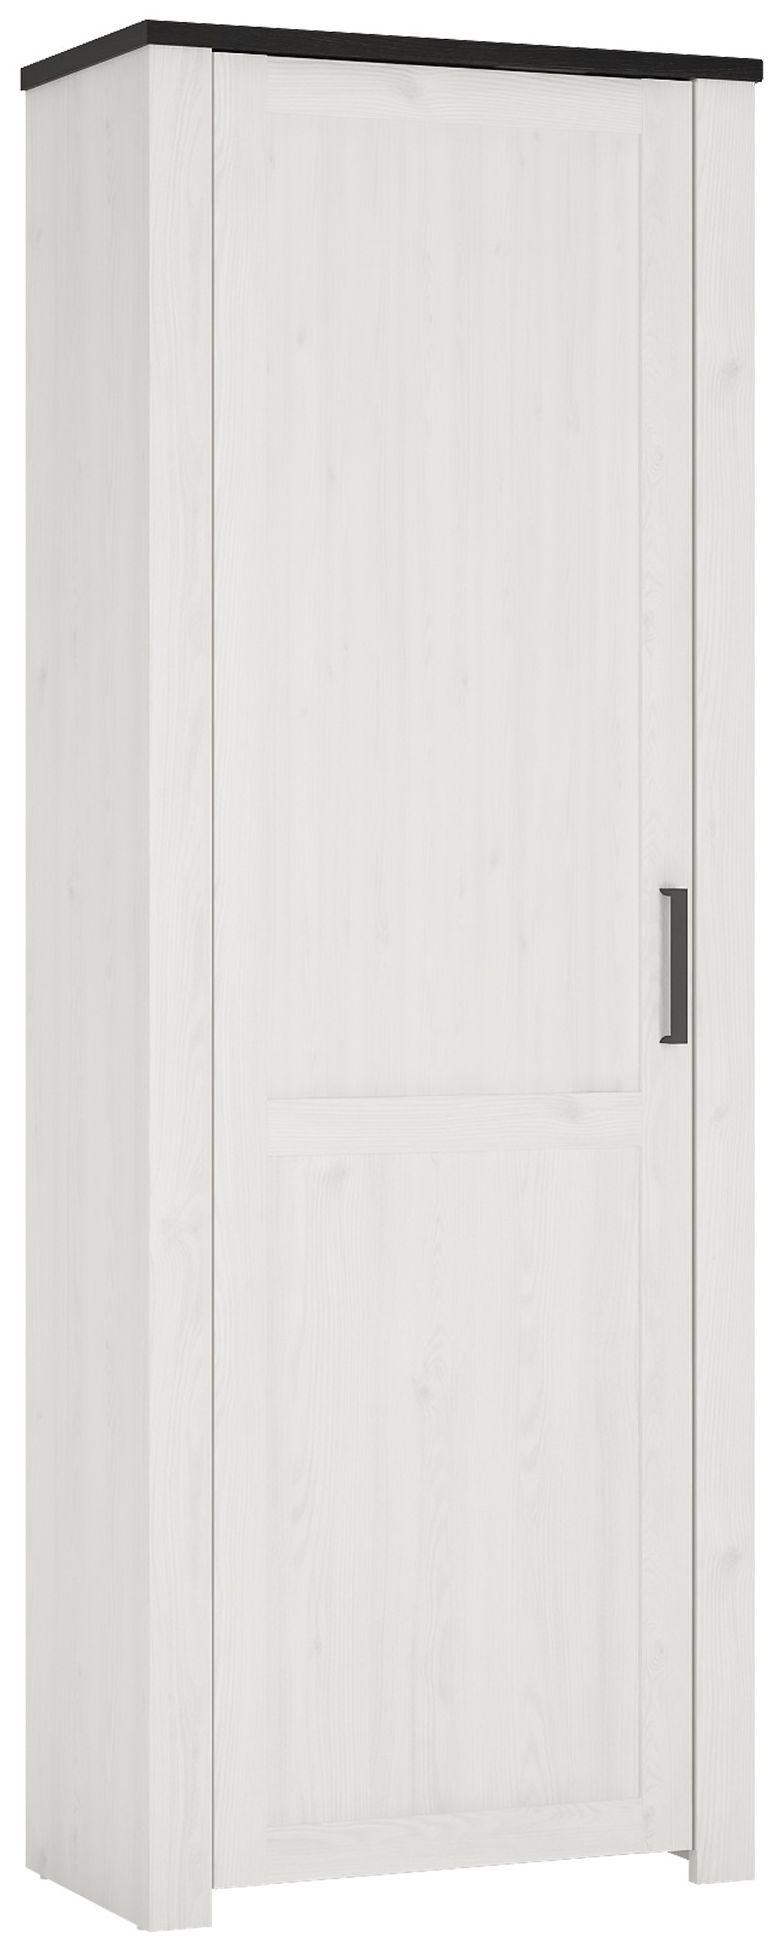 Provence Whitewash Larch Wardrobe - 1 Door